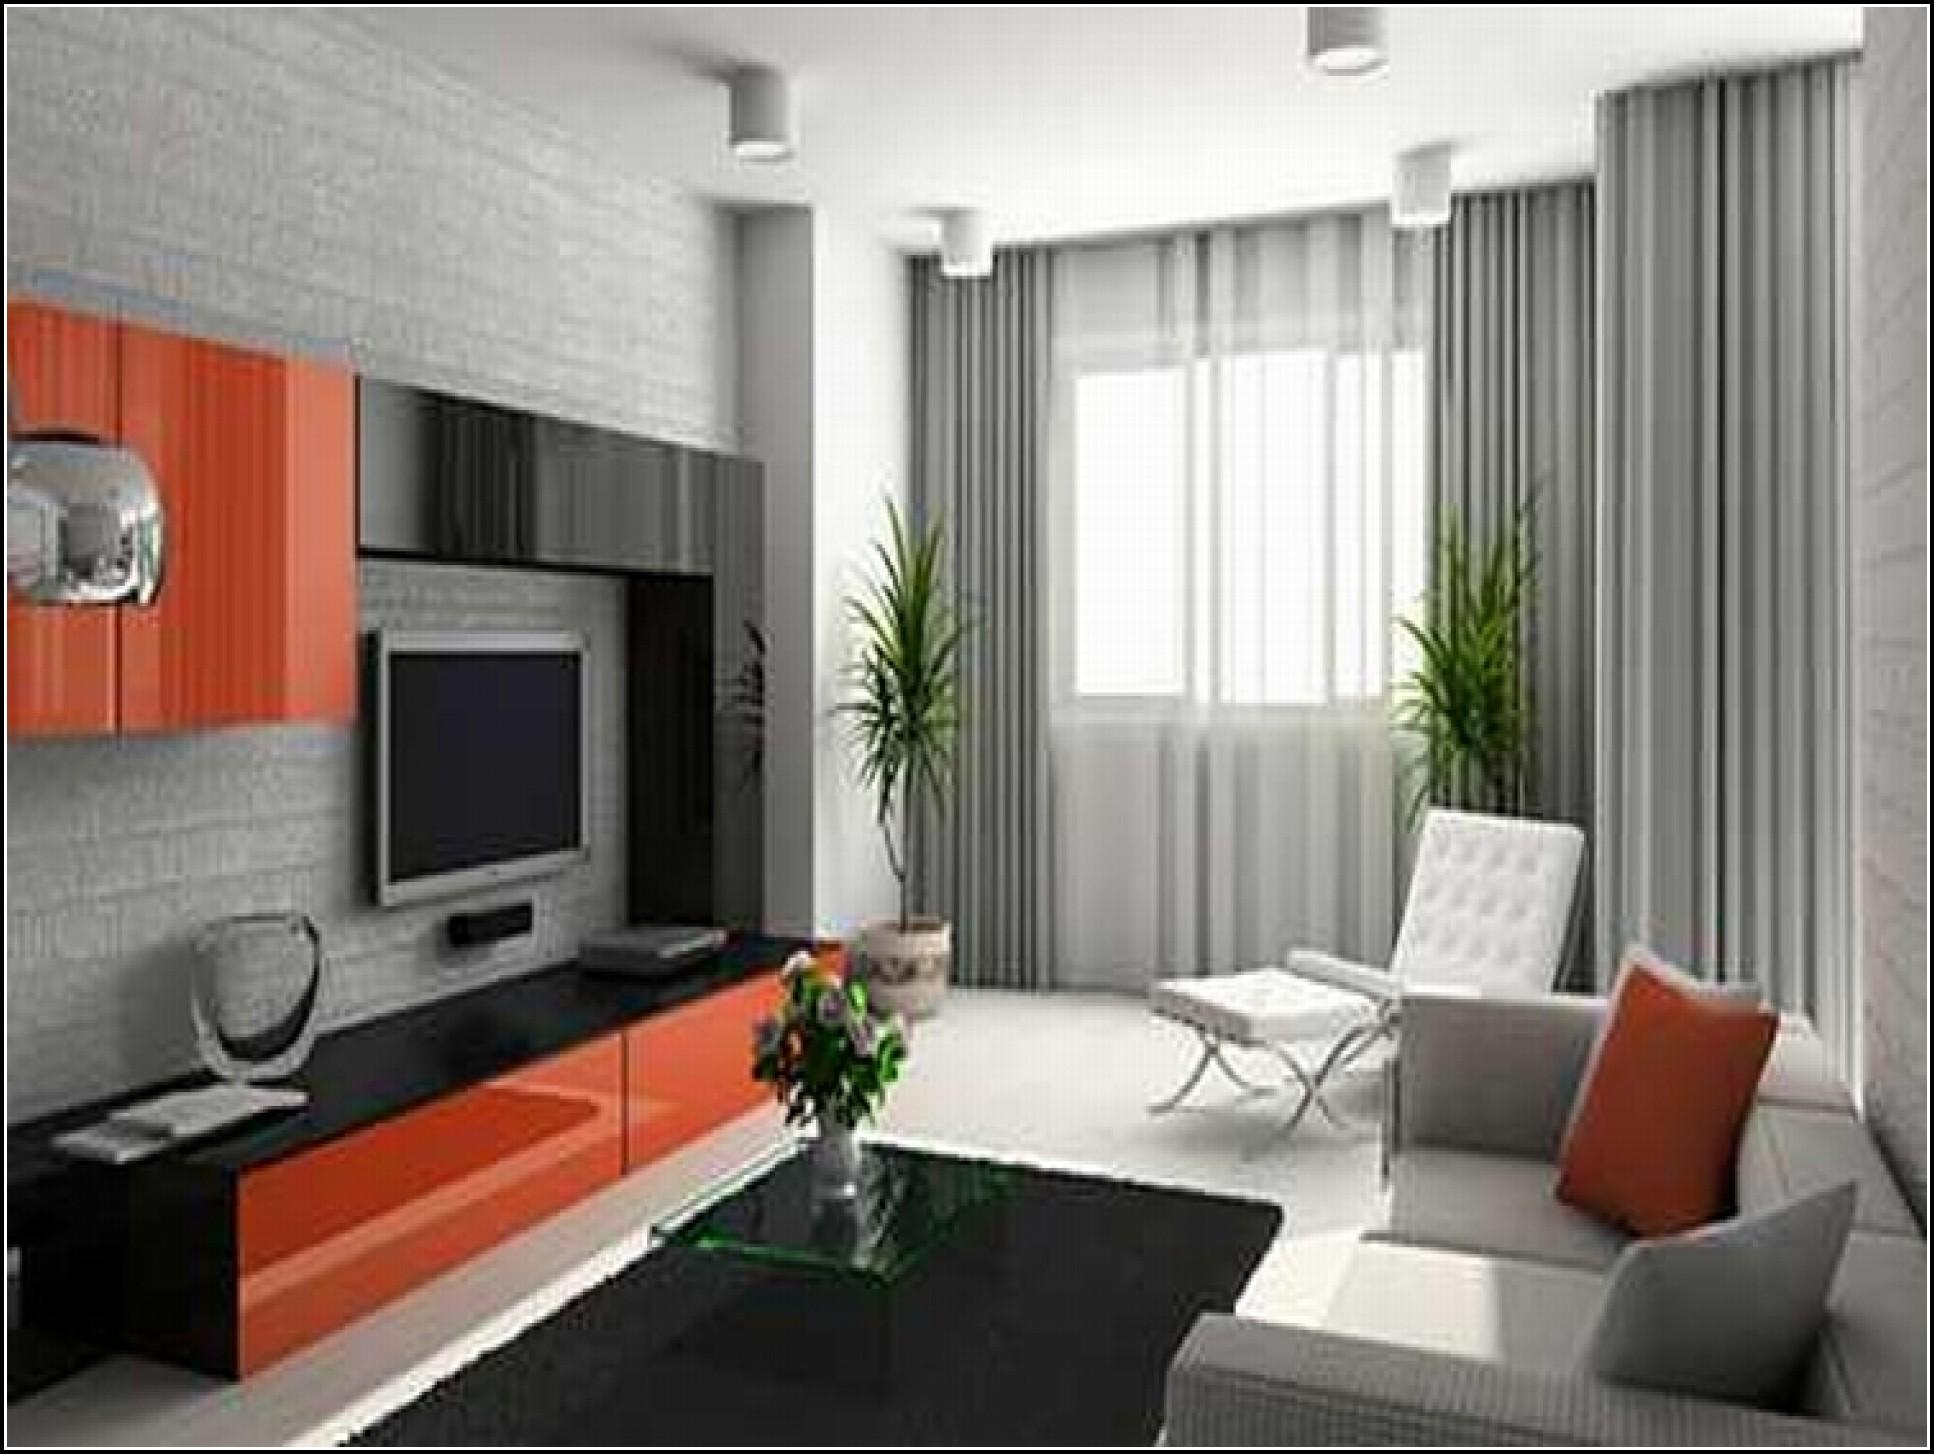 Living room window curtains designs curtains home design ideas ymngoegnro29856 - Living room window design ideas ...